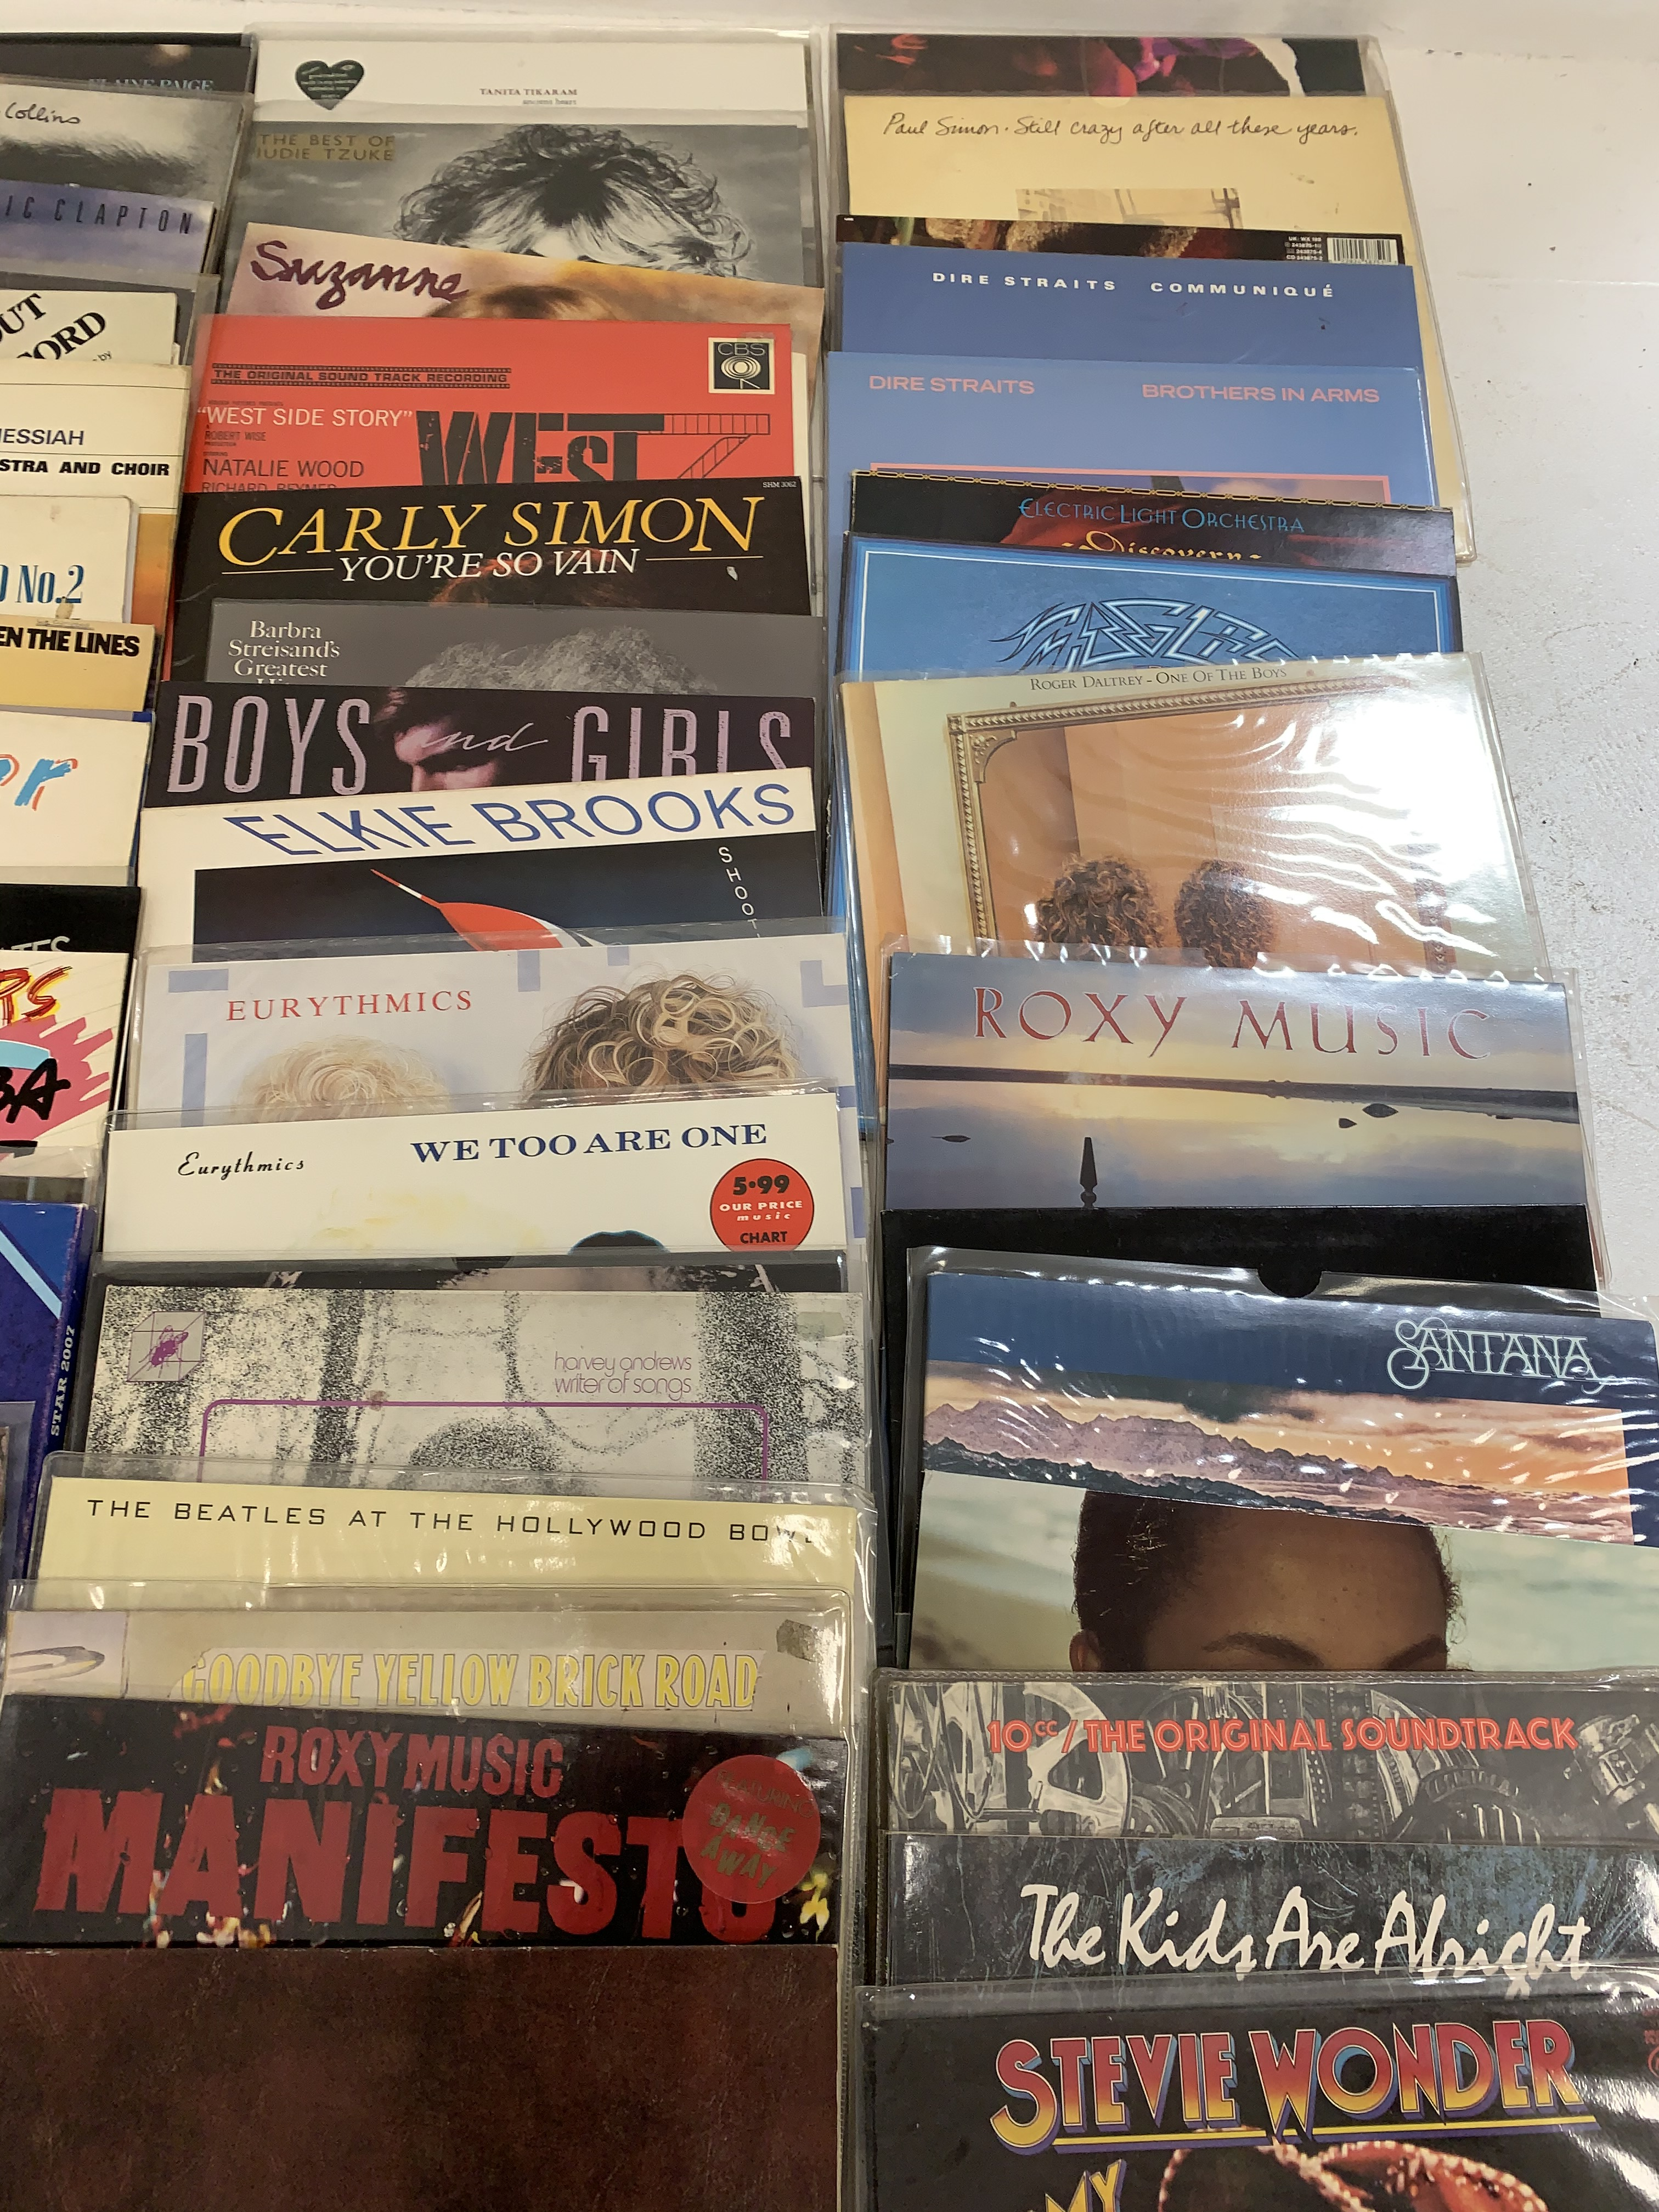 A quantity of LP's to include Elton John, Lionel Richie, Jimi Hendrix, The Beatles, Paul Simon, The - Image 6 of 7